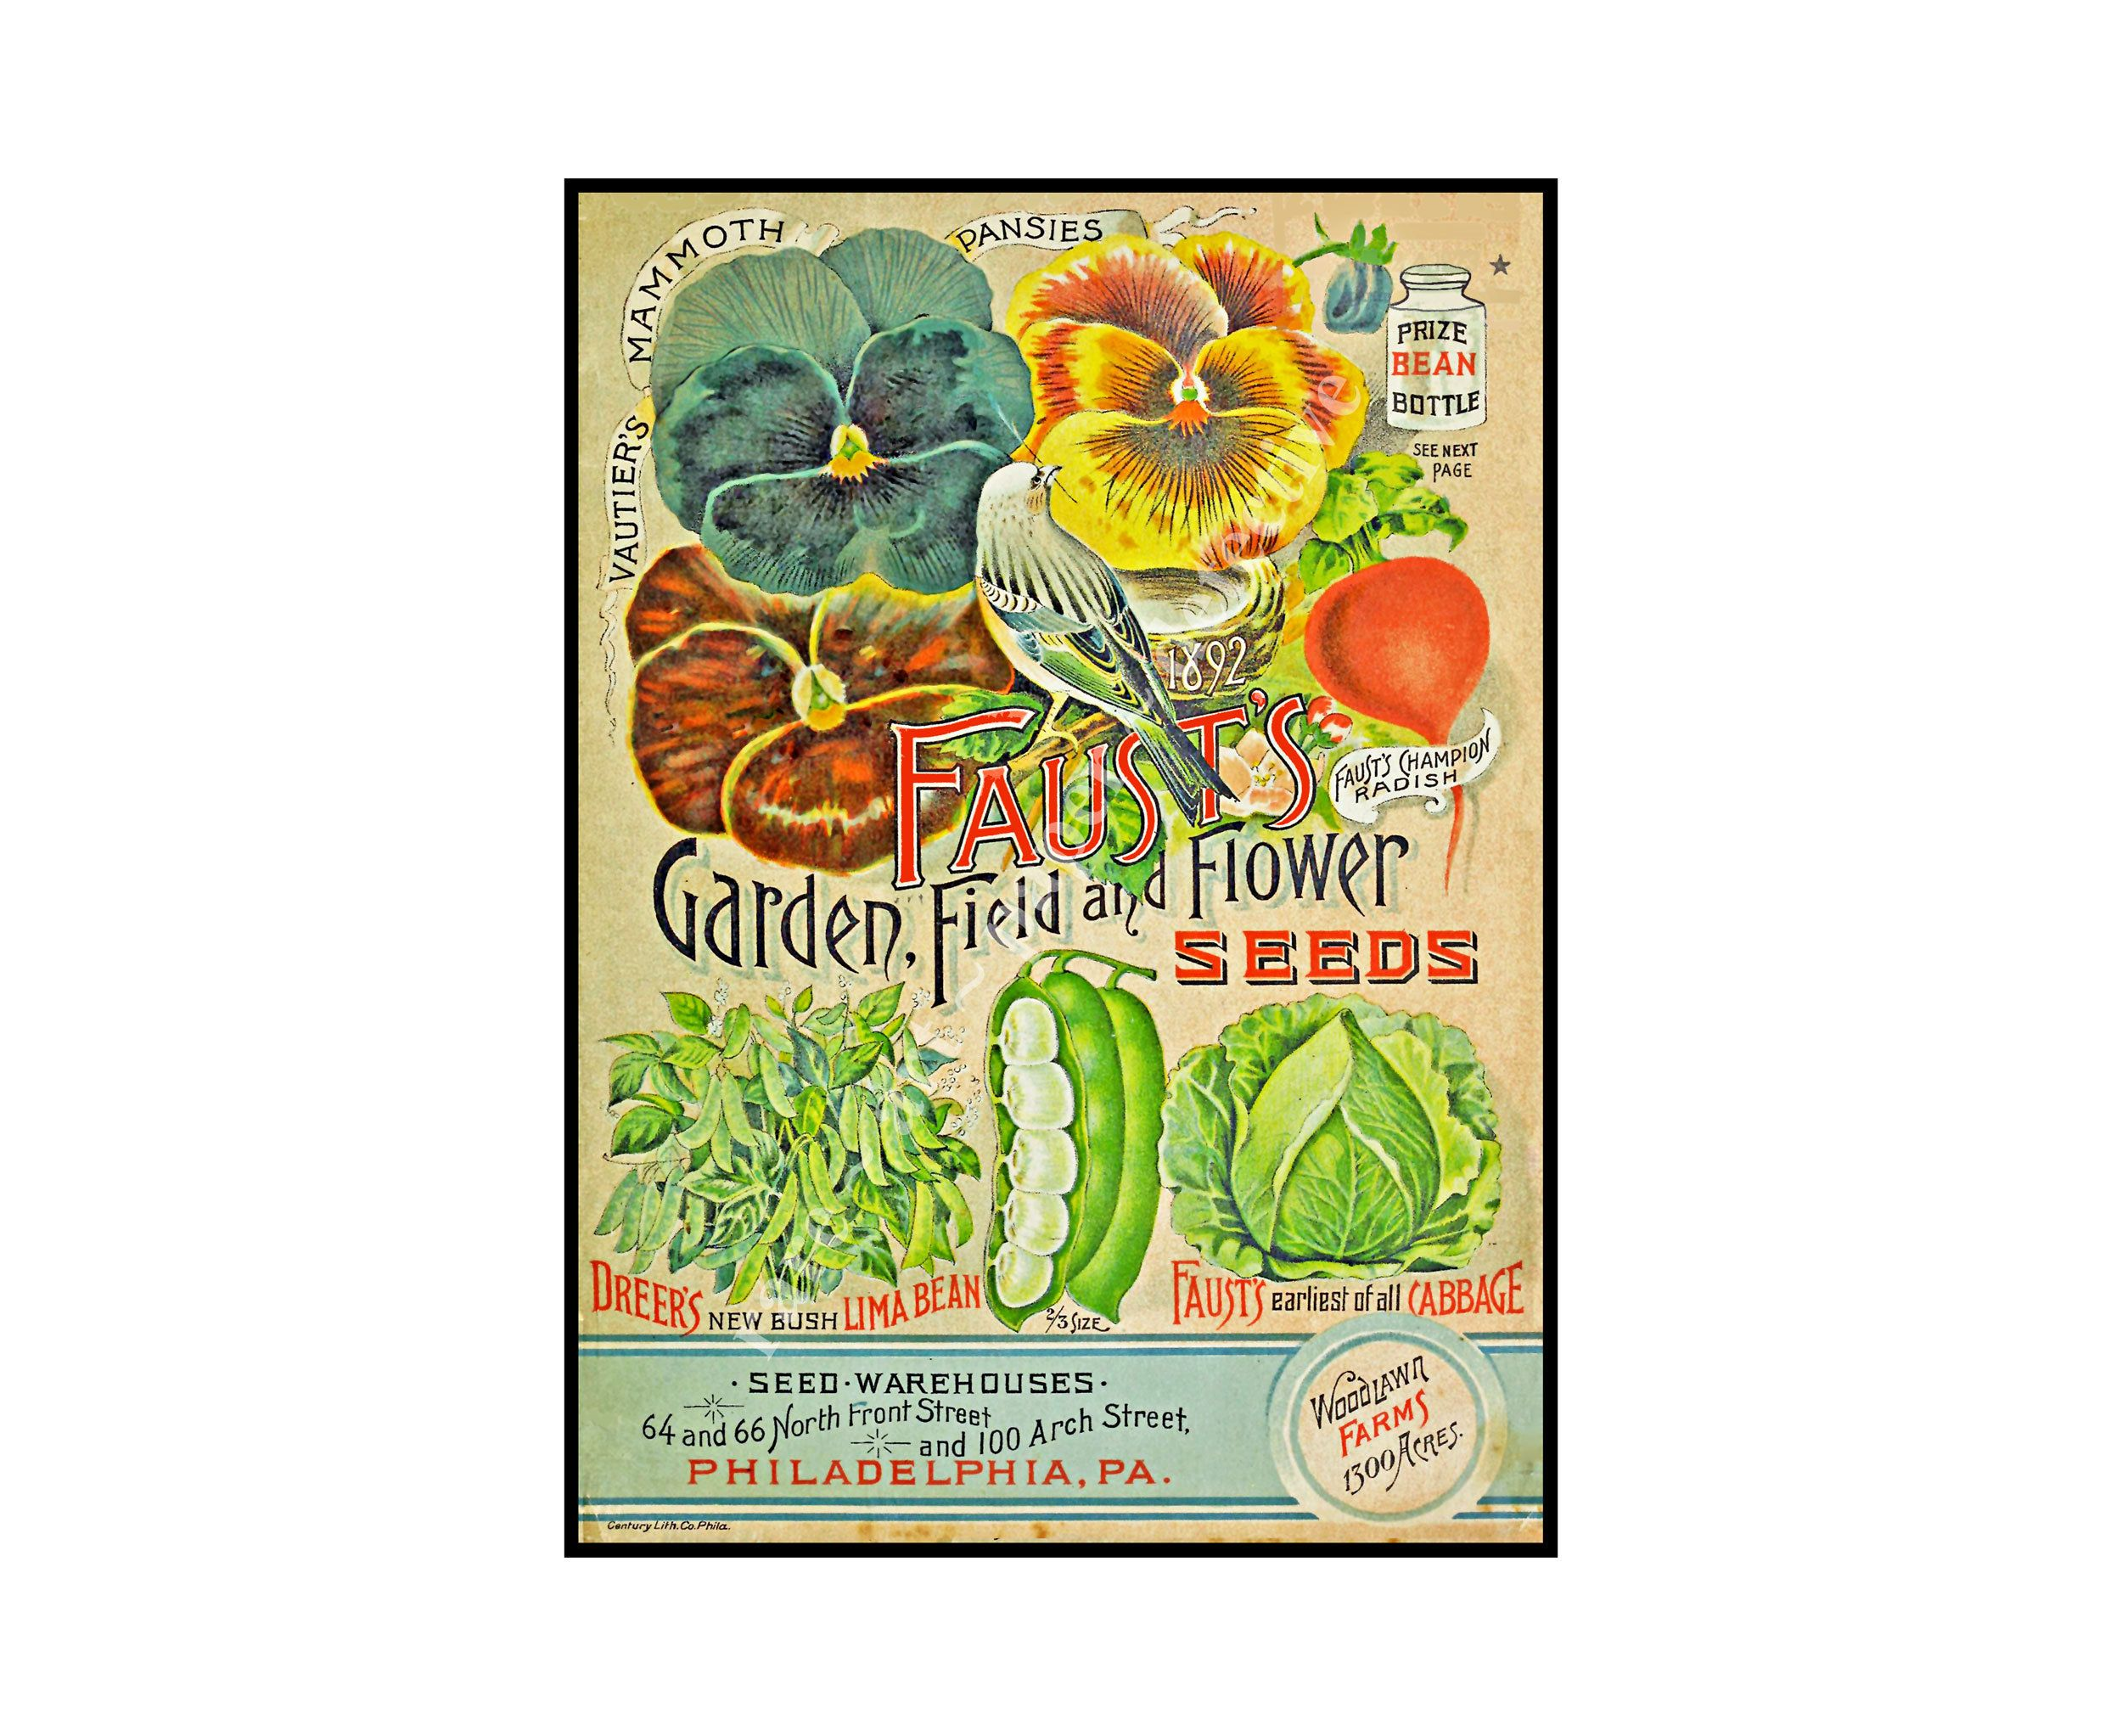 Pin on Garden & Farm Decor Prints, Seed Pack & Catalog Art